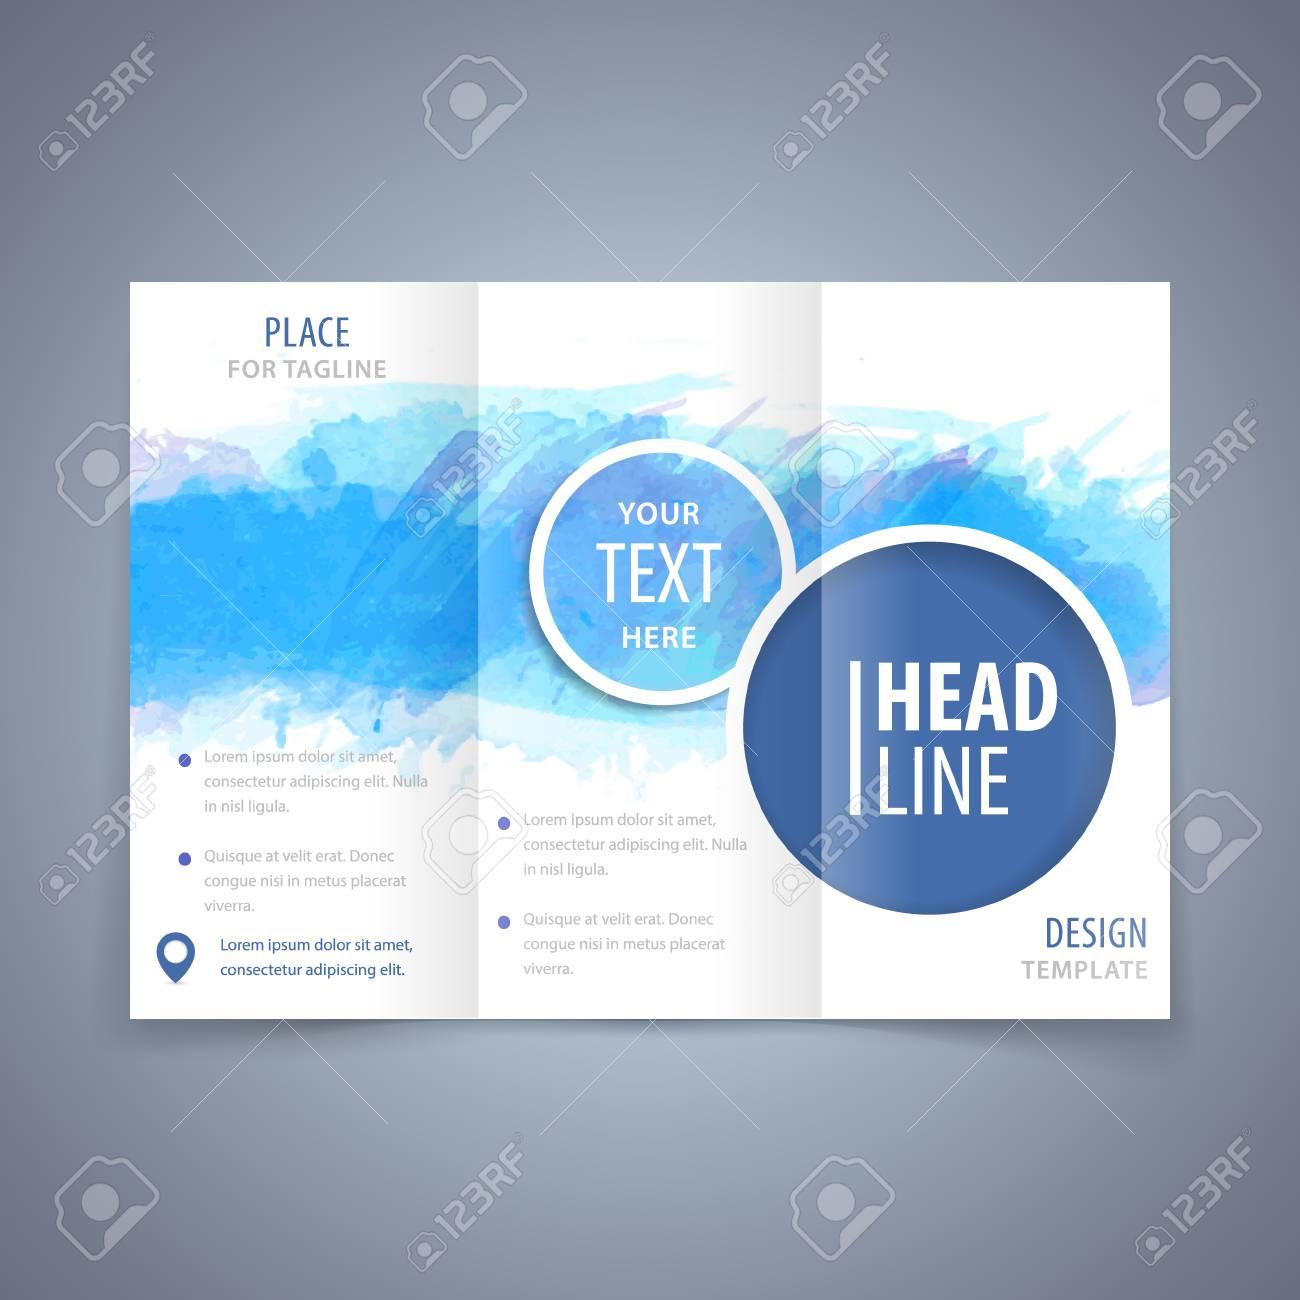 Vector Modern Flyer Poster Or Tri Fold Brochure Design Template